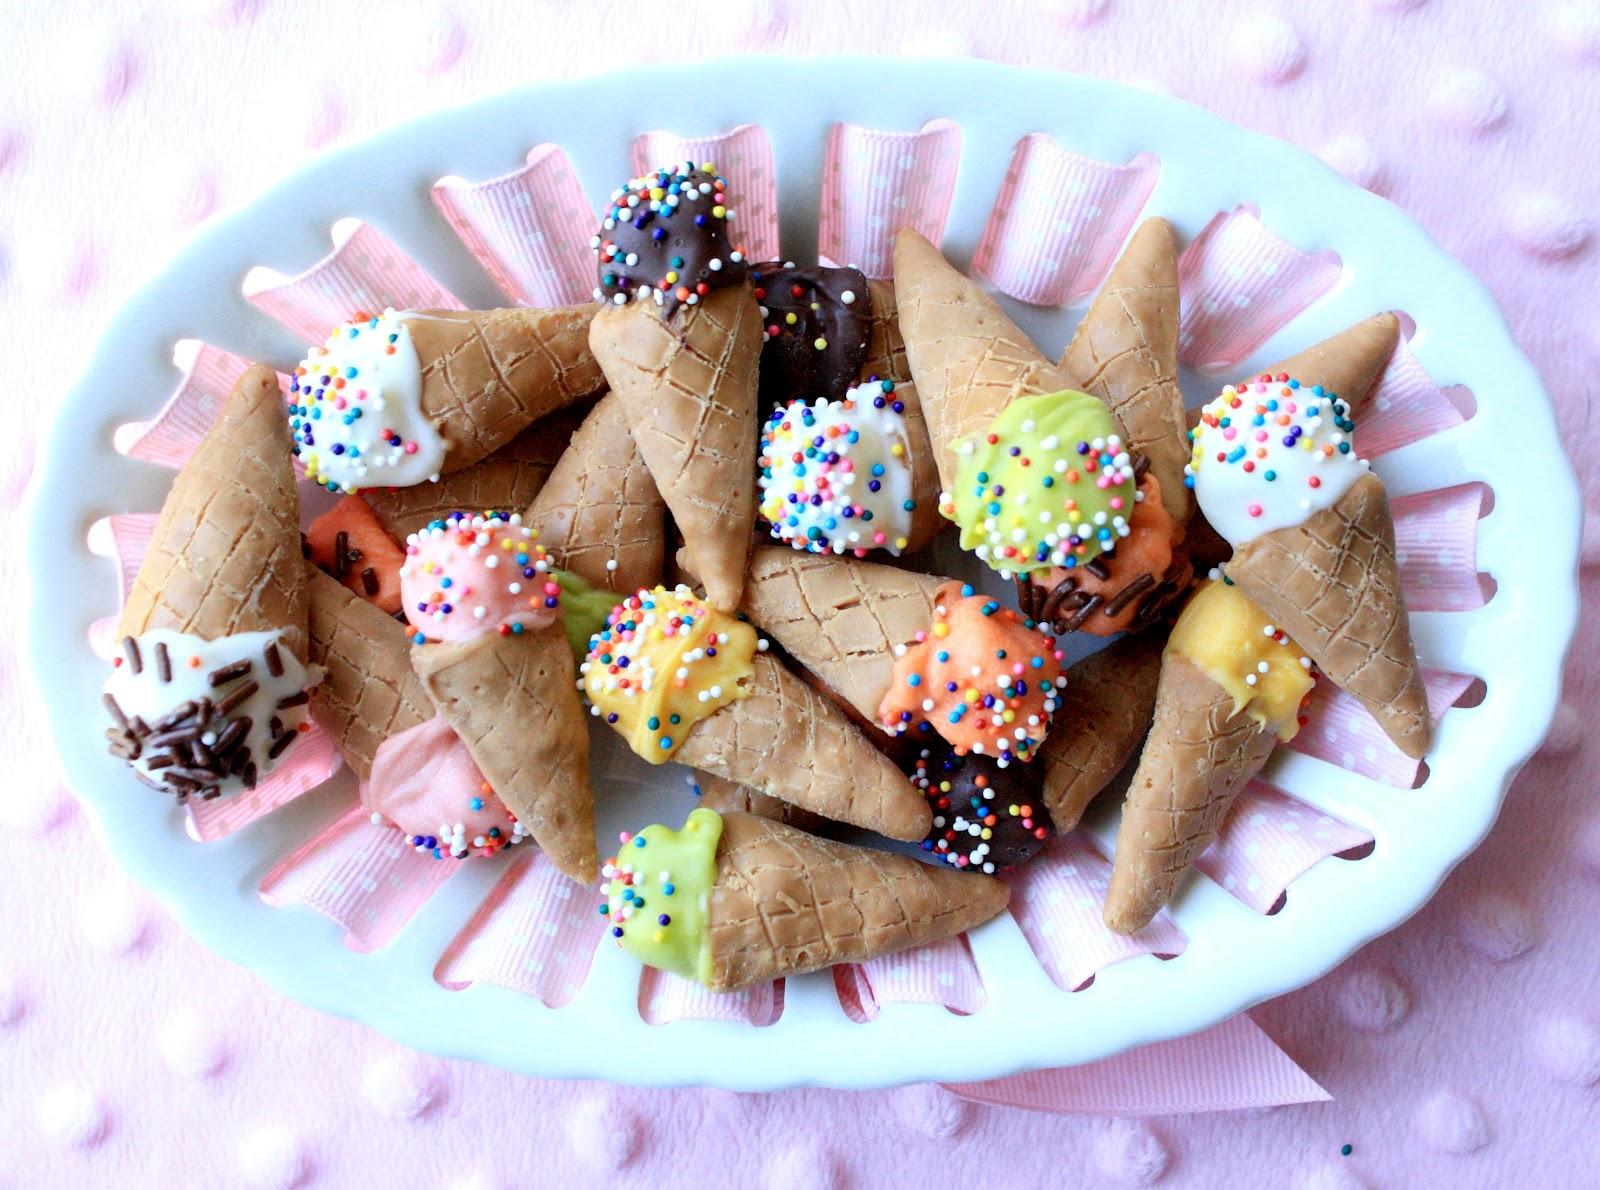 Munchkin Munchies: Sweet and Salty